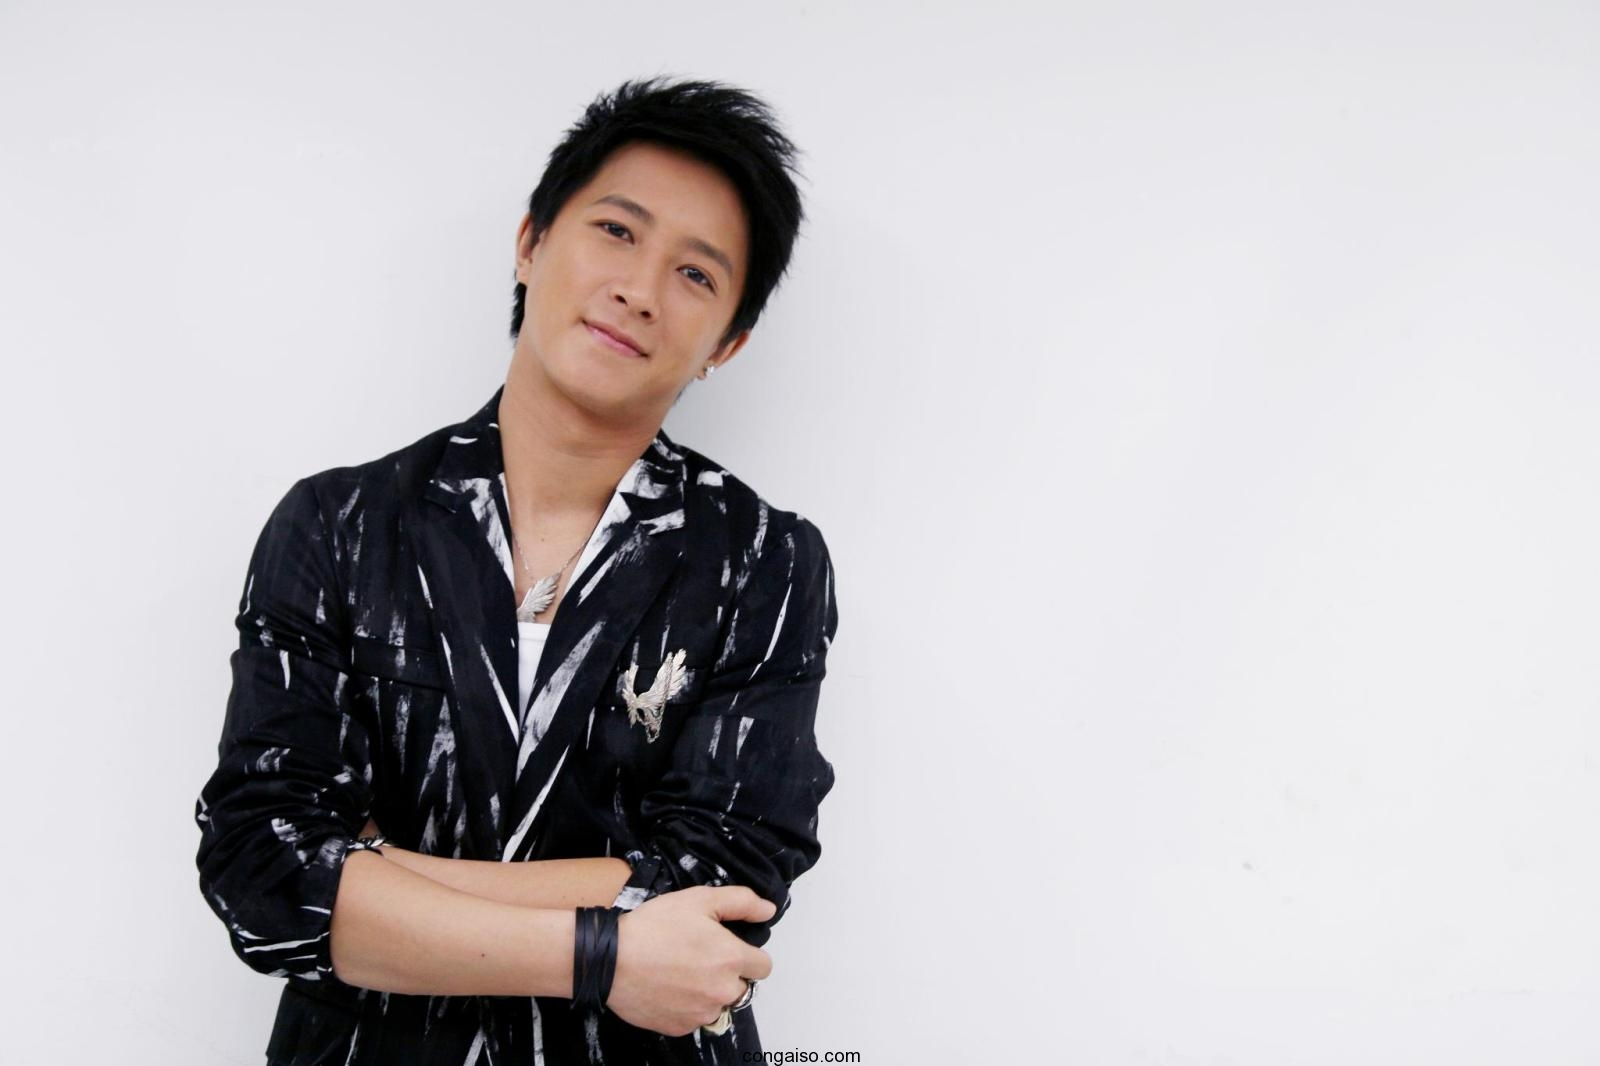 Thong-tin-ve-cac-thanh-vien-trong-nhom-Super-Junior-4